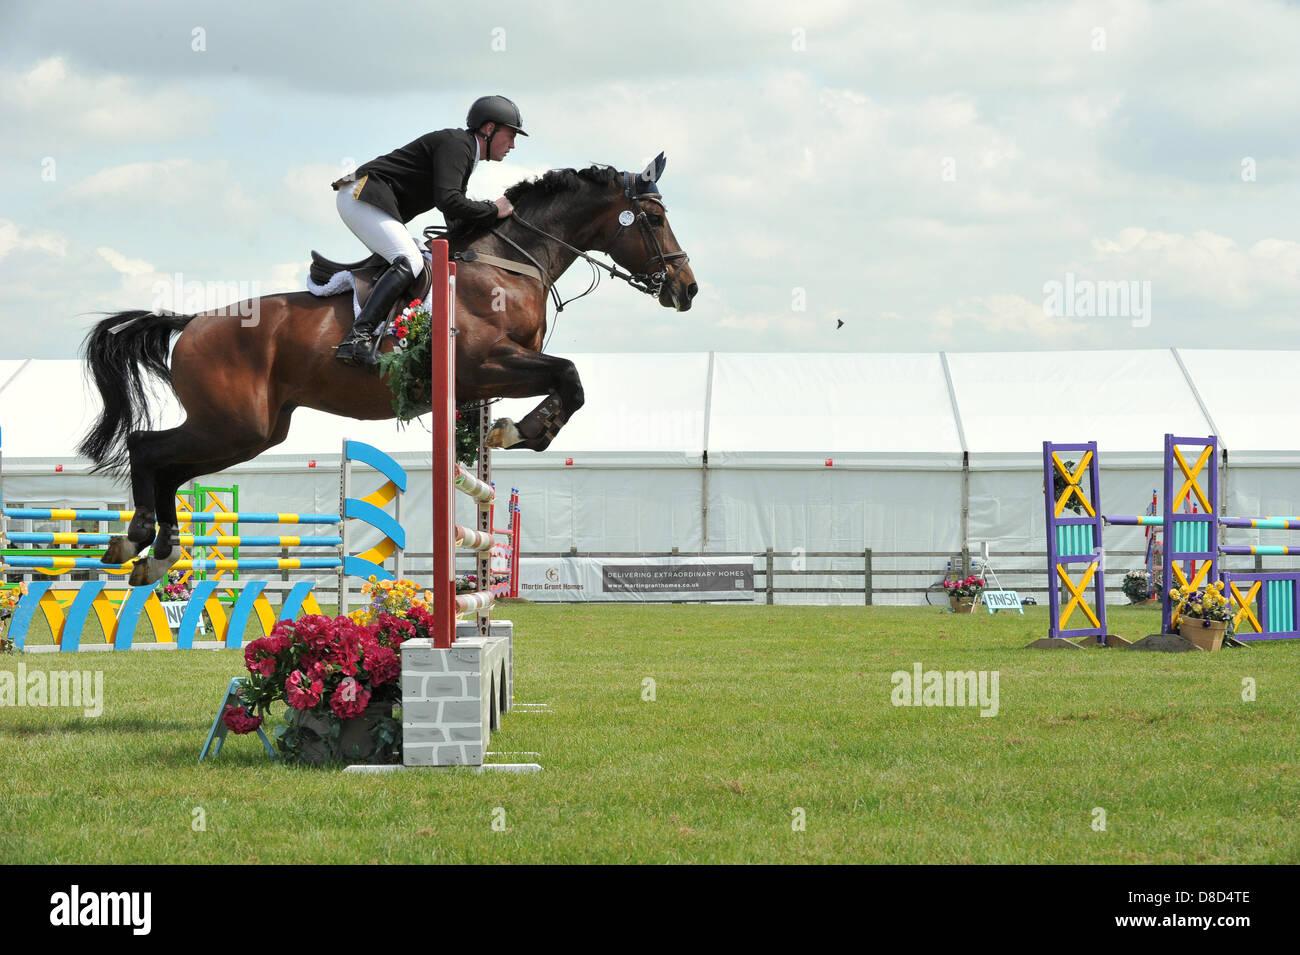 REDBOURN, UK. Il 25 maggio 2013. Show Jumping all'Hertfordshire County Show. Lancia Whitehouse compete in Nazionale Immagini Stock